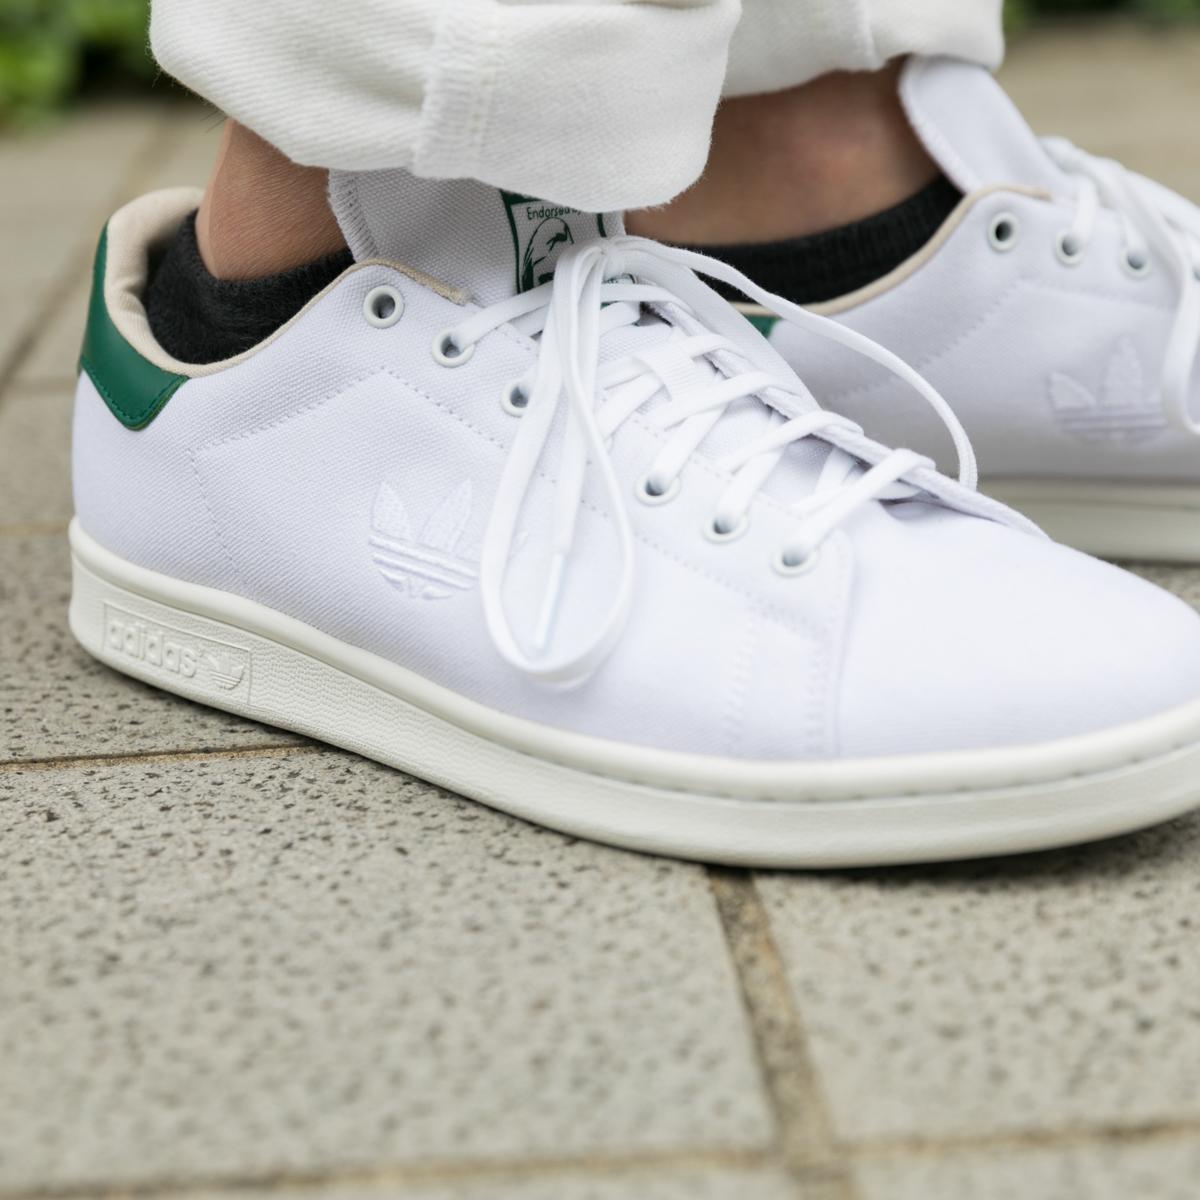 adidas Originals Stan Smith(アディダス オリジナルス スタンスミス)Running White/Running White/Collegeate Green【メンズ レディース スニーカー】18FW-I